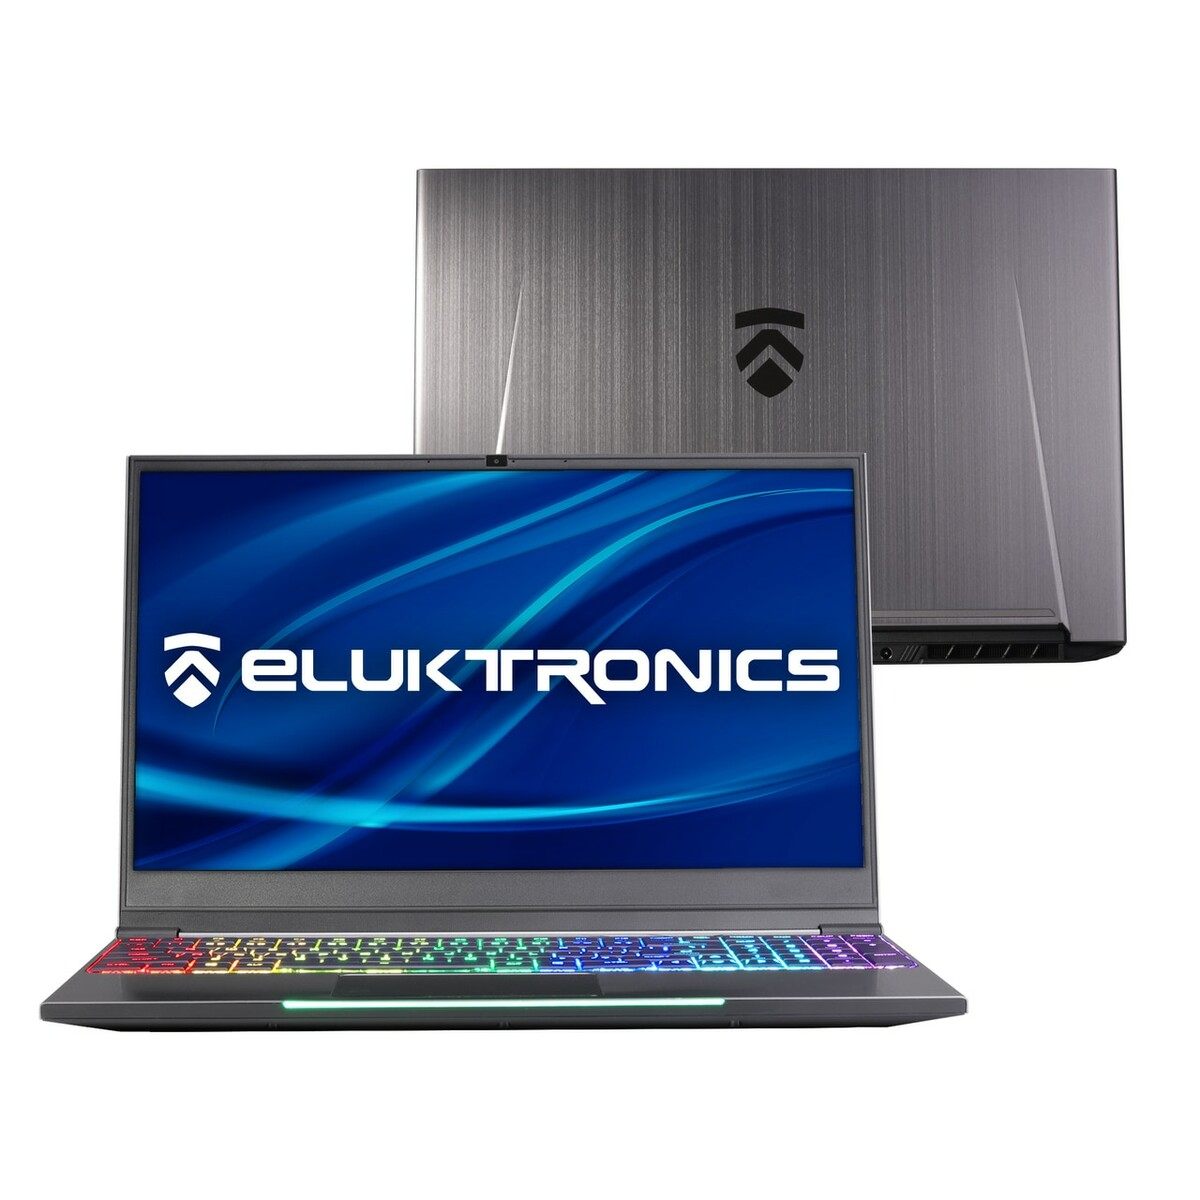 Cheap Max-Q — Walmart-based Eluktronics Mech-15 G2 laptop with RTX